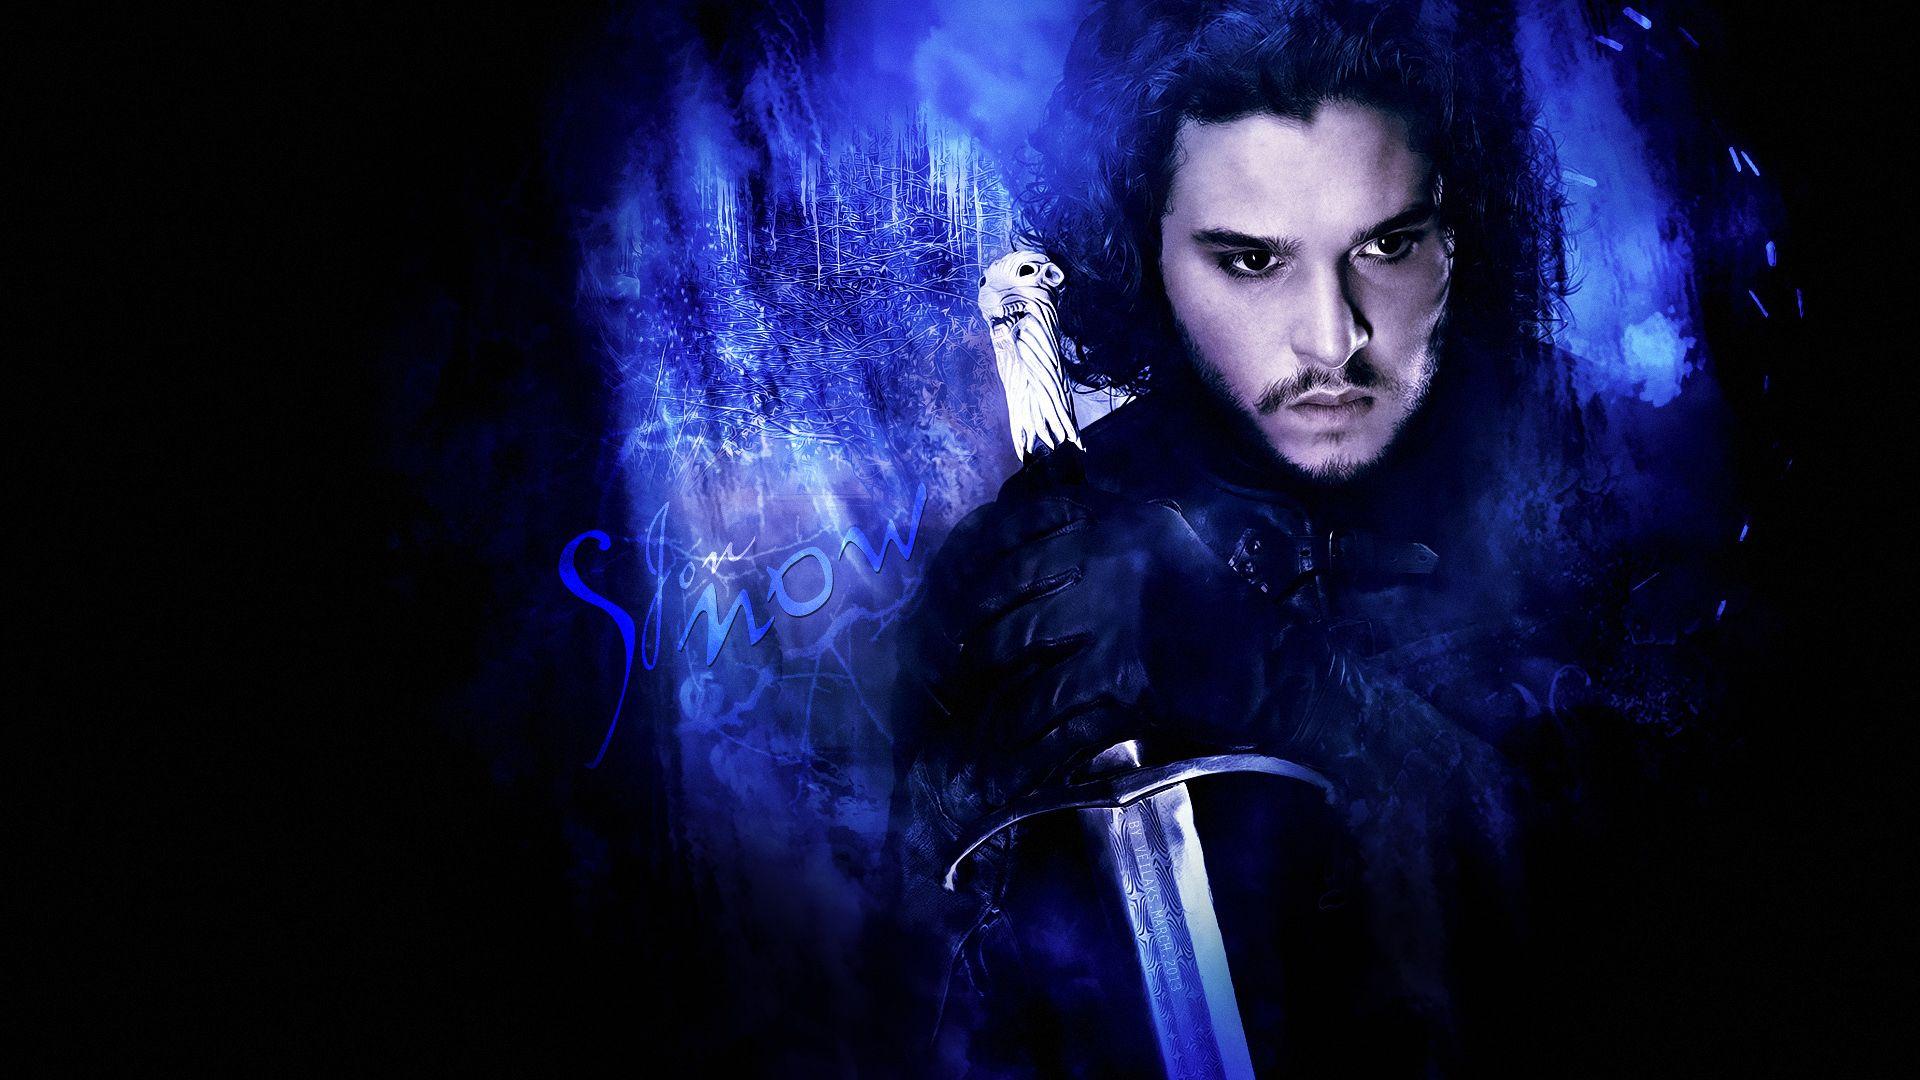 Game Of Thrones Wallpaper Jon Snow Jon Snow New Hd Pic Snow